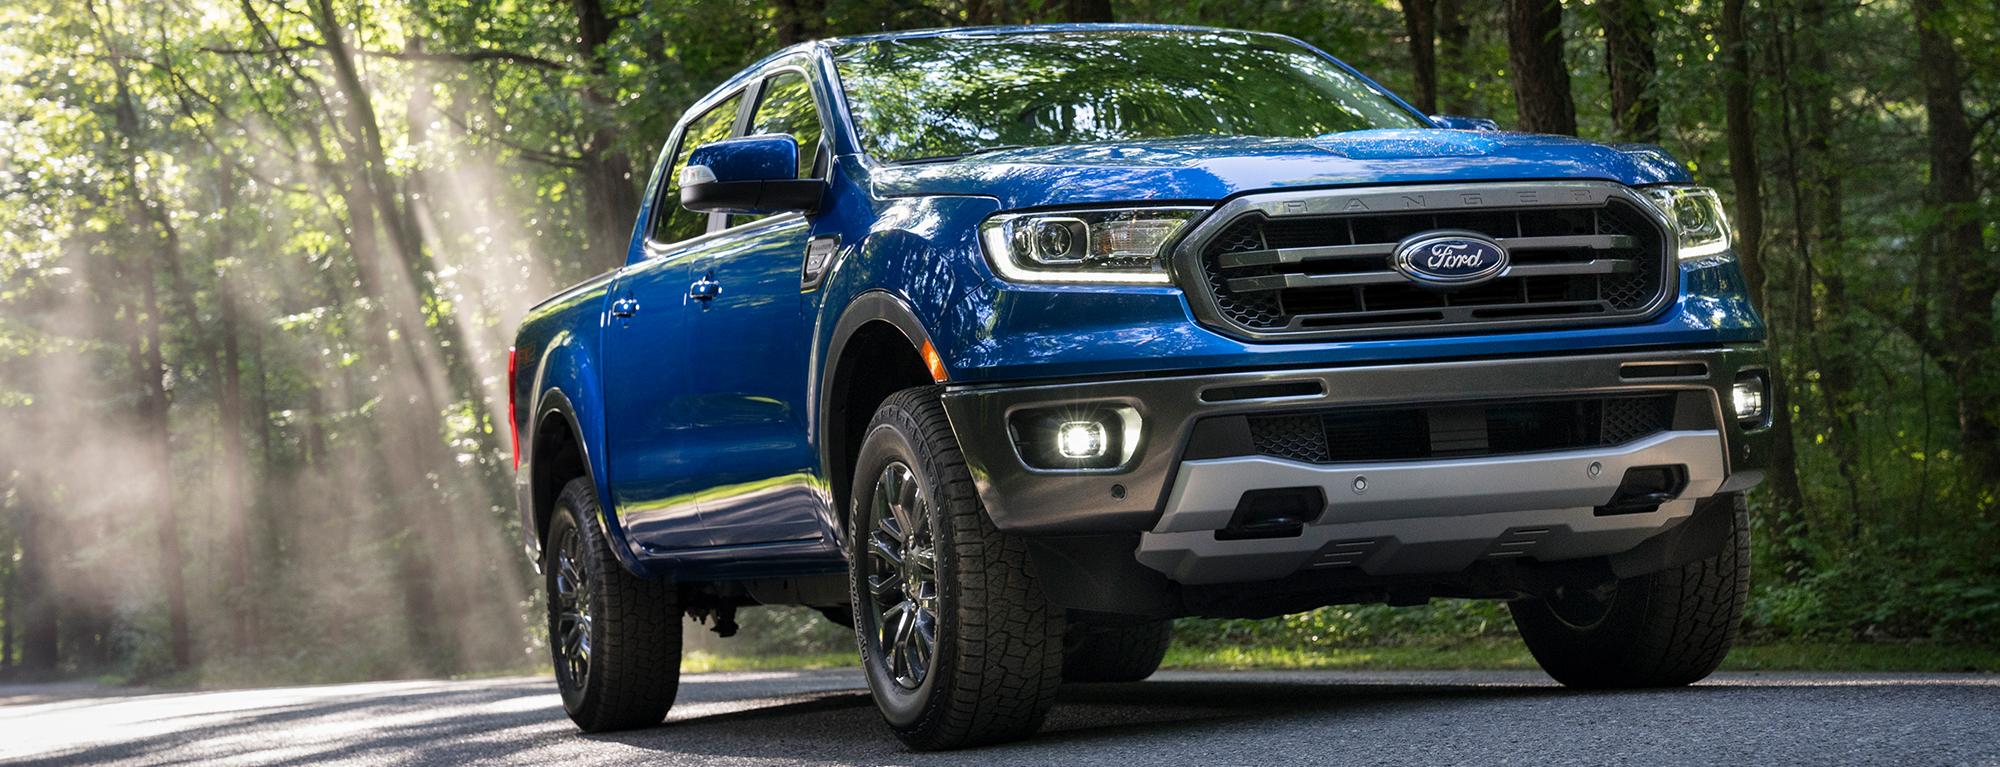 Ford Ranger payload capacity